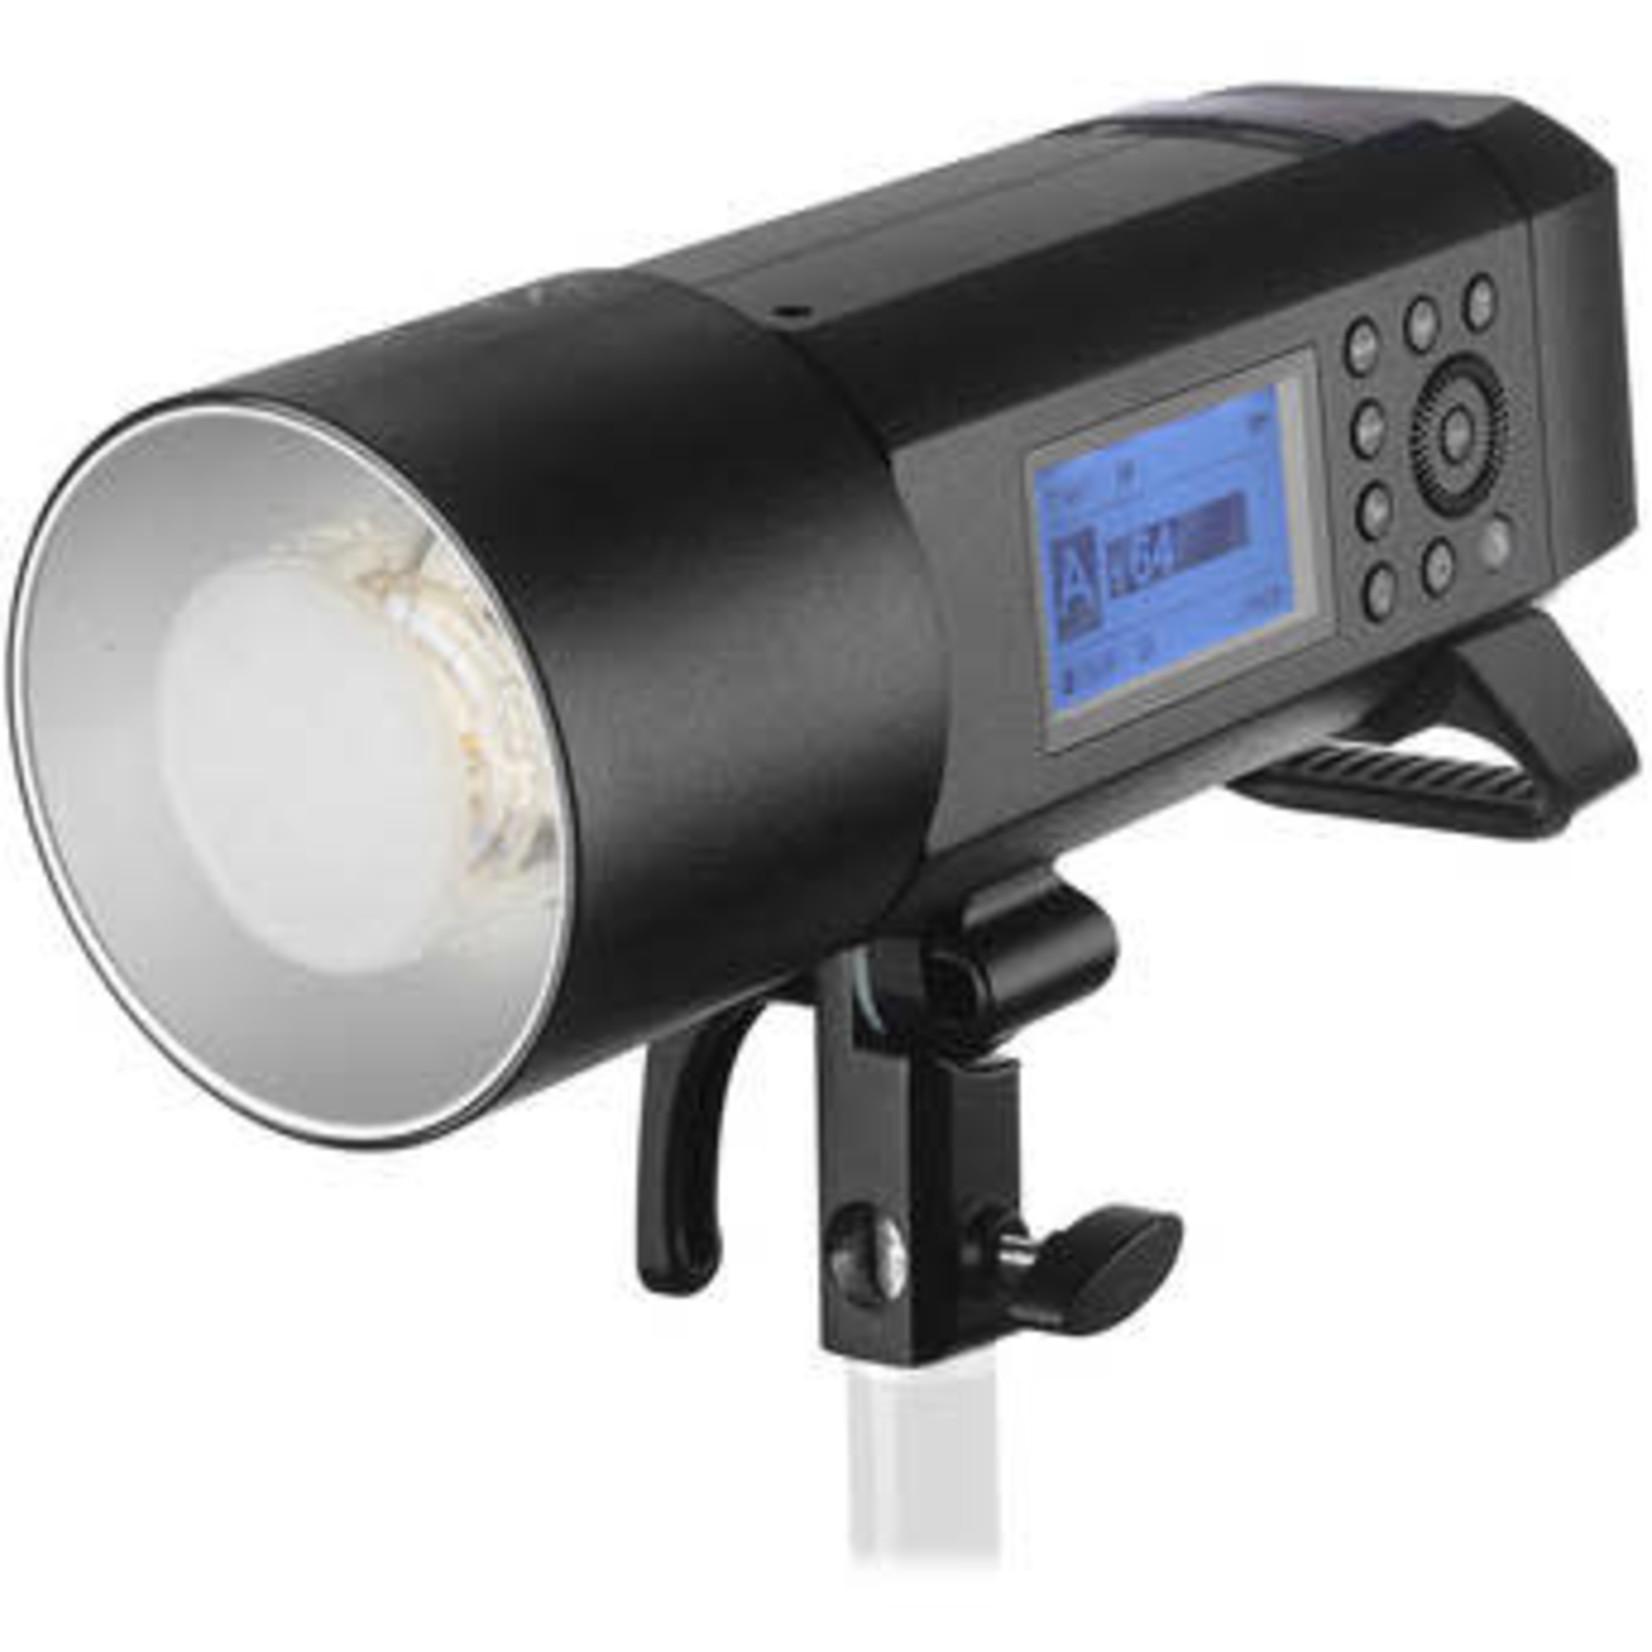 Godox Godox Witstro 400 W/S AD400 Pro TTL All-in-One Outdoor Flash